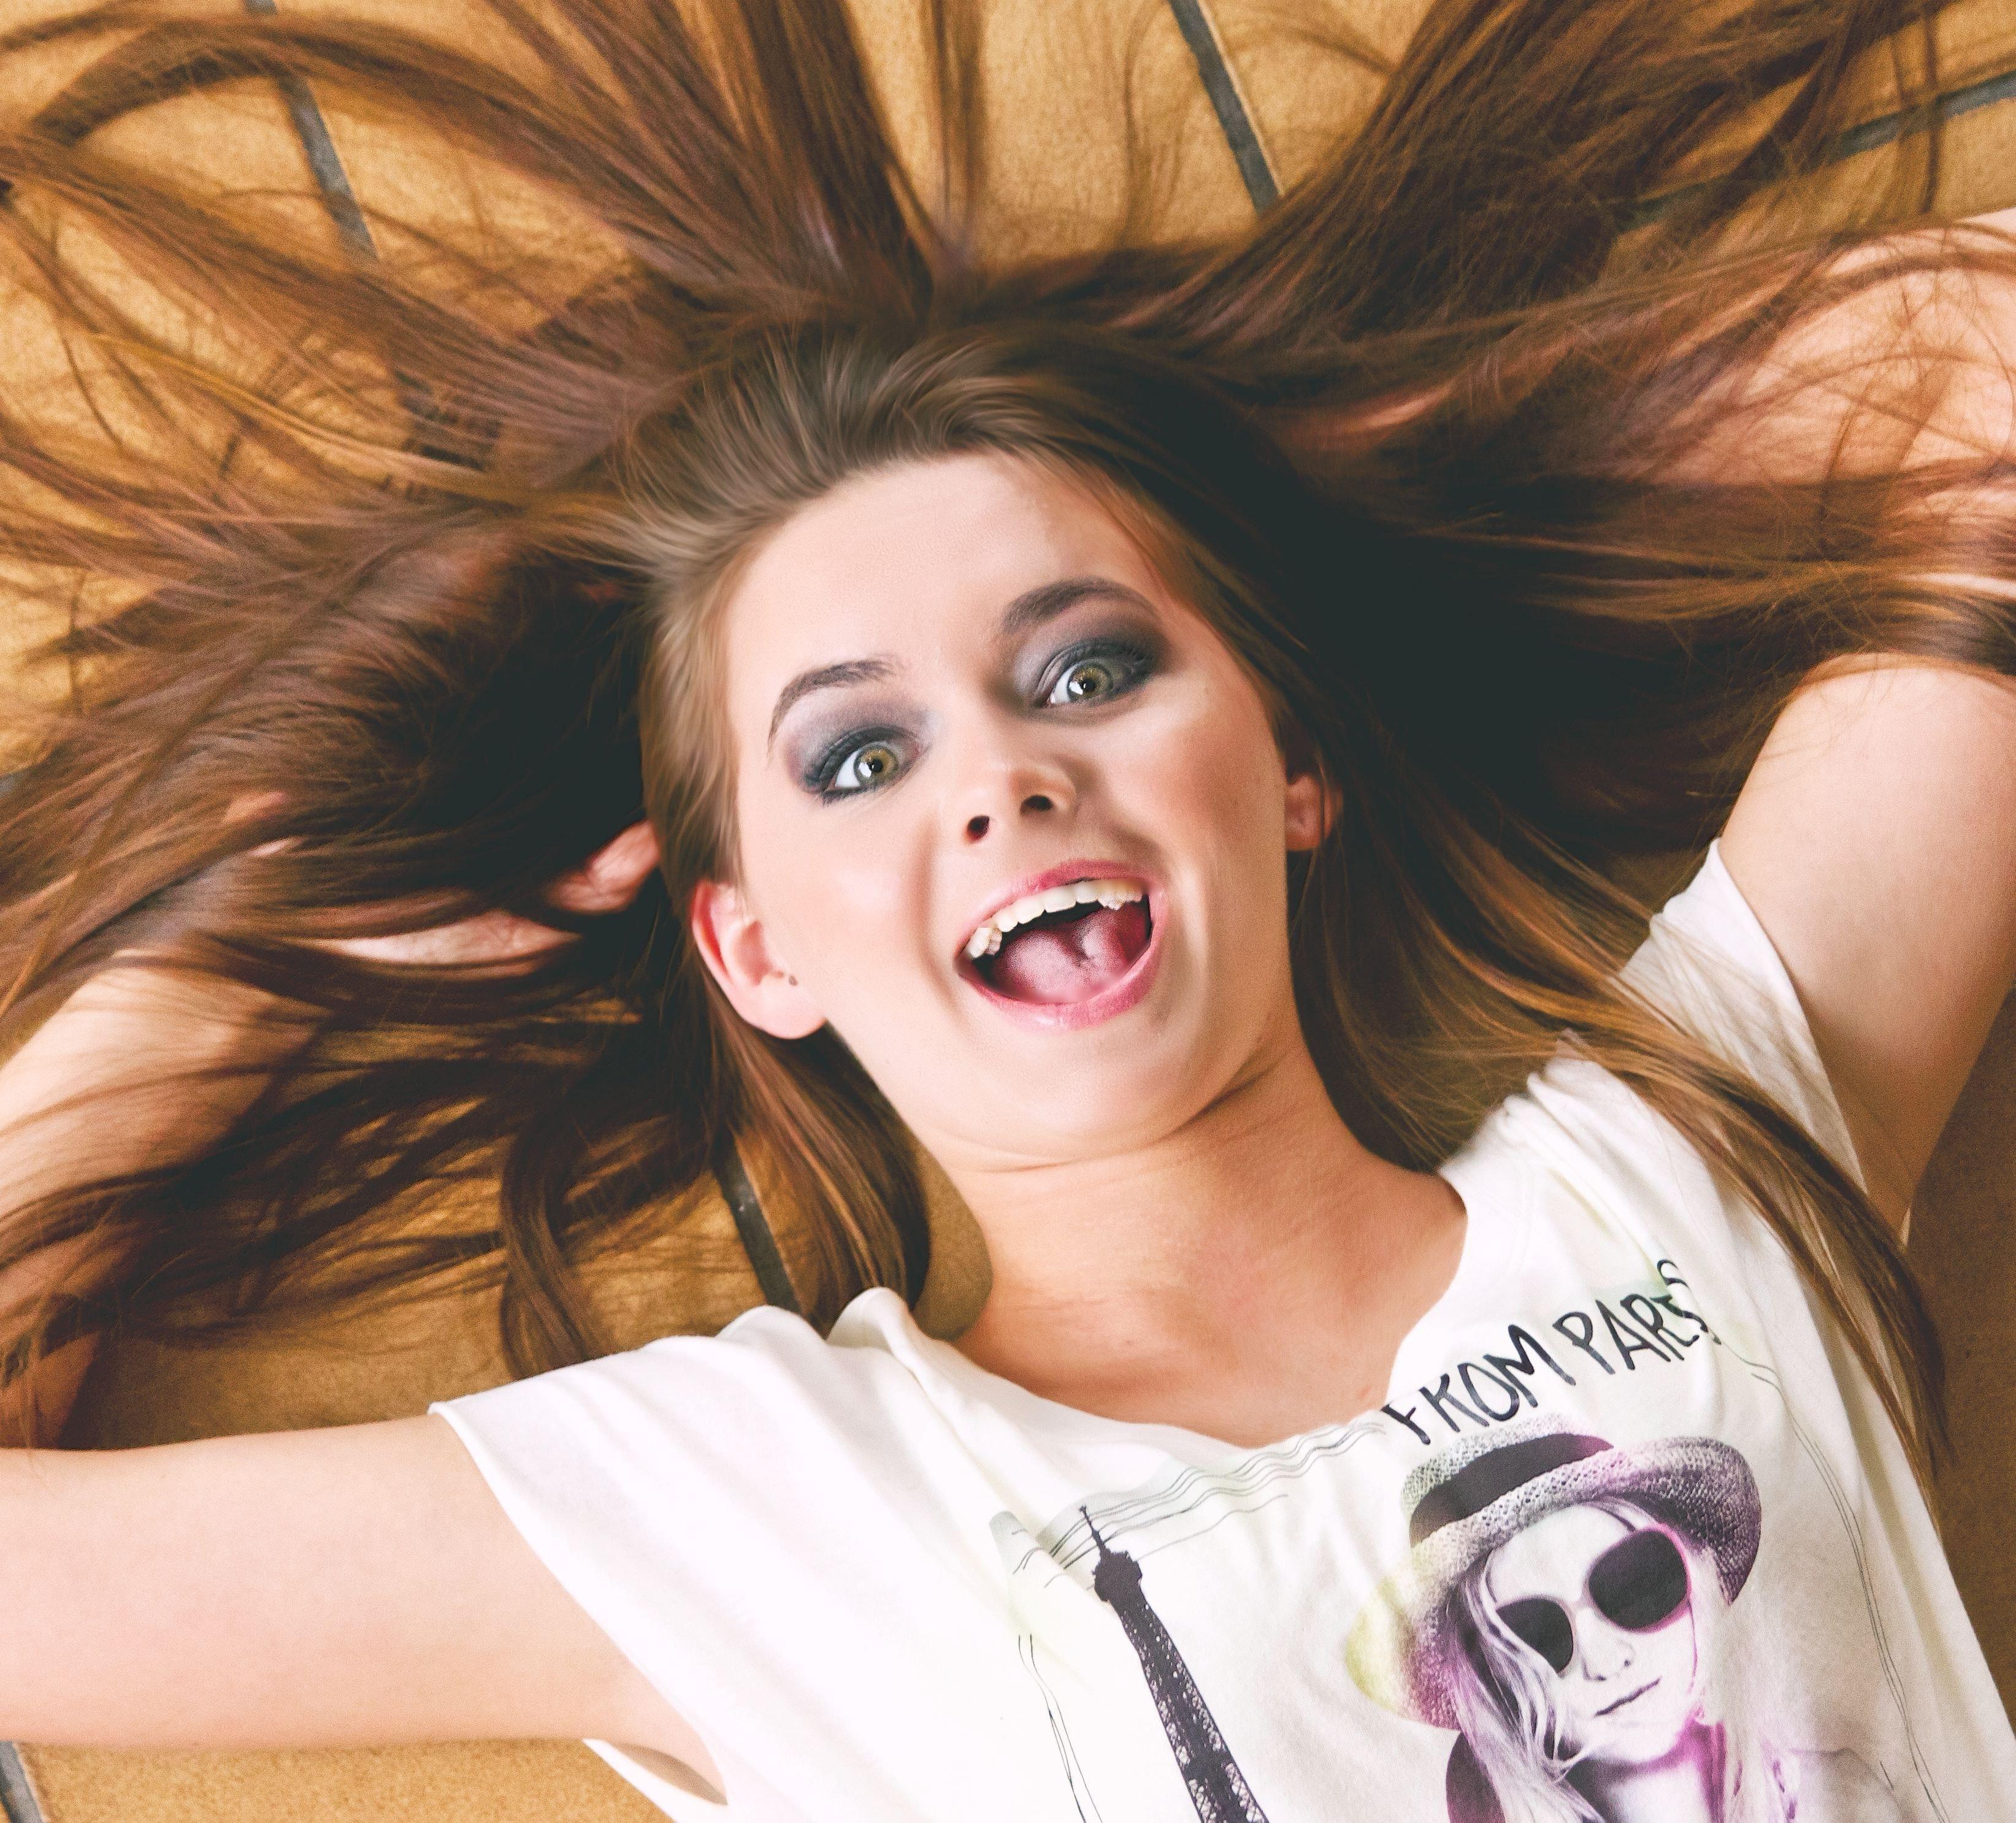 Woman in White and Purple Scoop Neck T Shirt, Beautiful, Brunette, Cute, Fun, HQ Photo